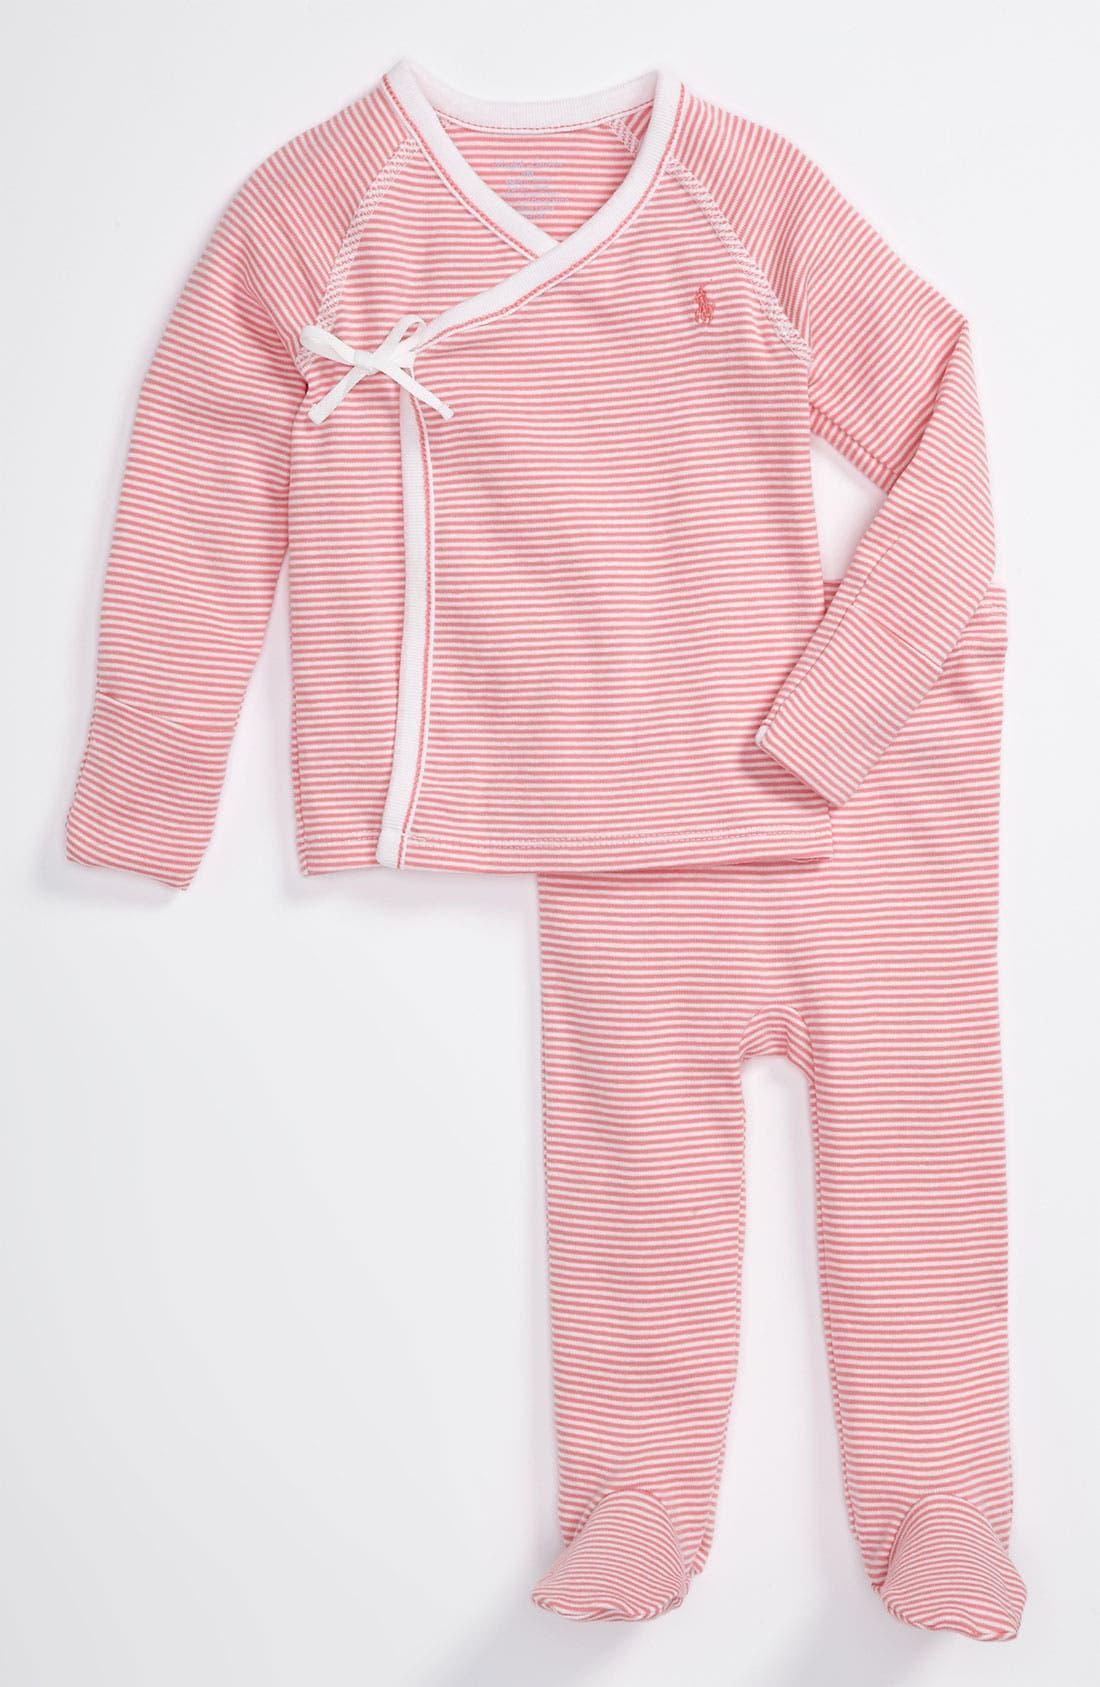 Main Image - Ralph Lauren Stripe Top & Footed Pants Set (Baby)